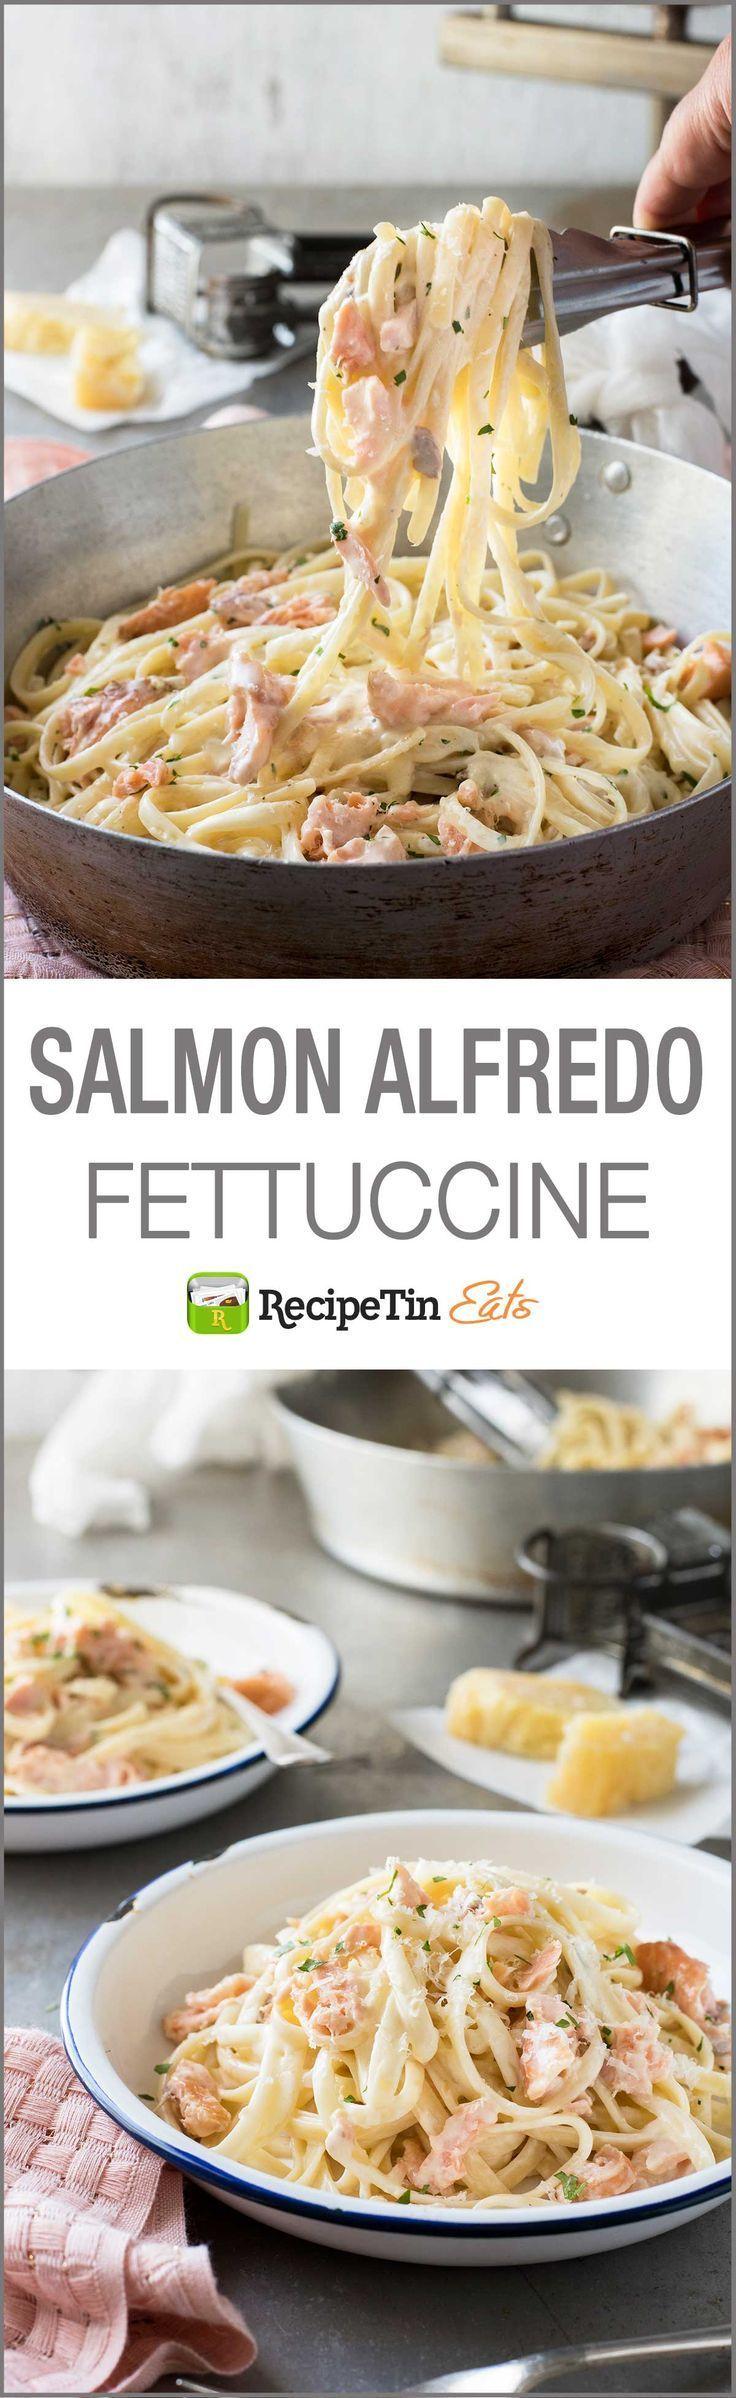 Salmon Alfredo Pasta - Fettuccine tossed in a creamy parmesan sauce and salmon, a magic combination! #seafoodrecipes